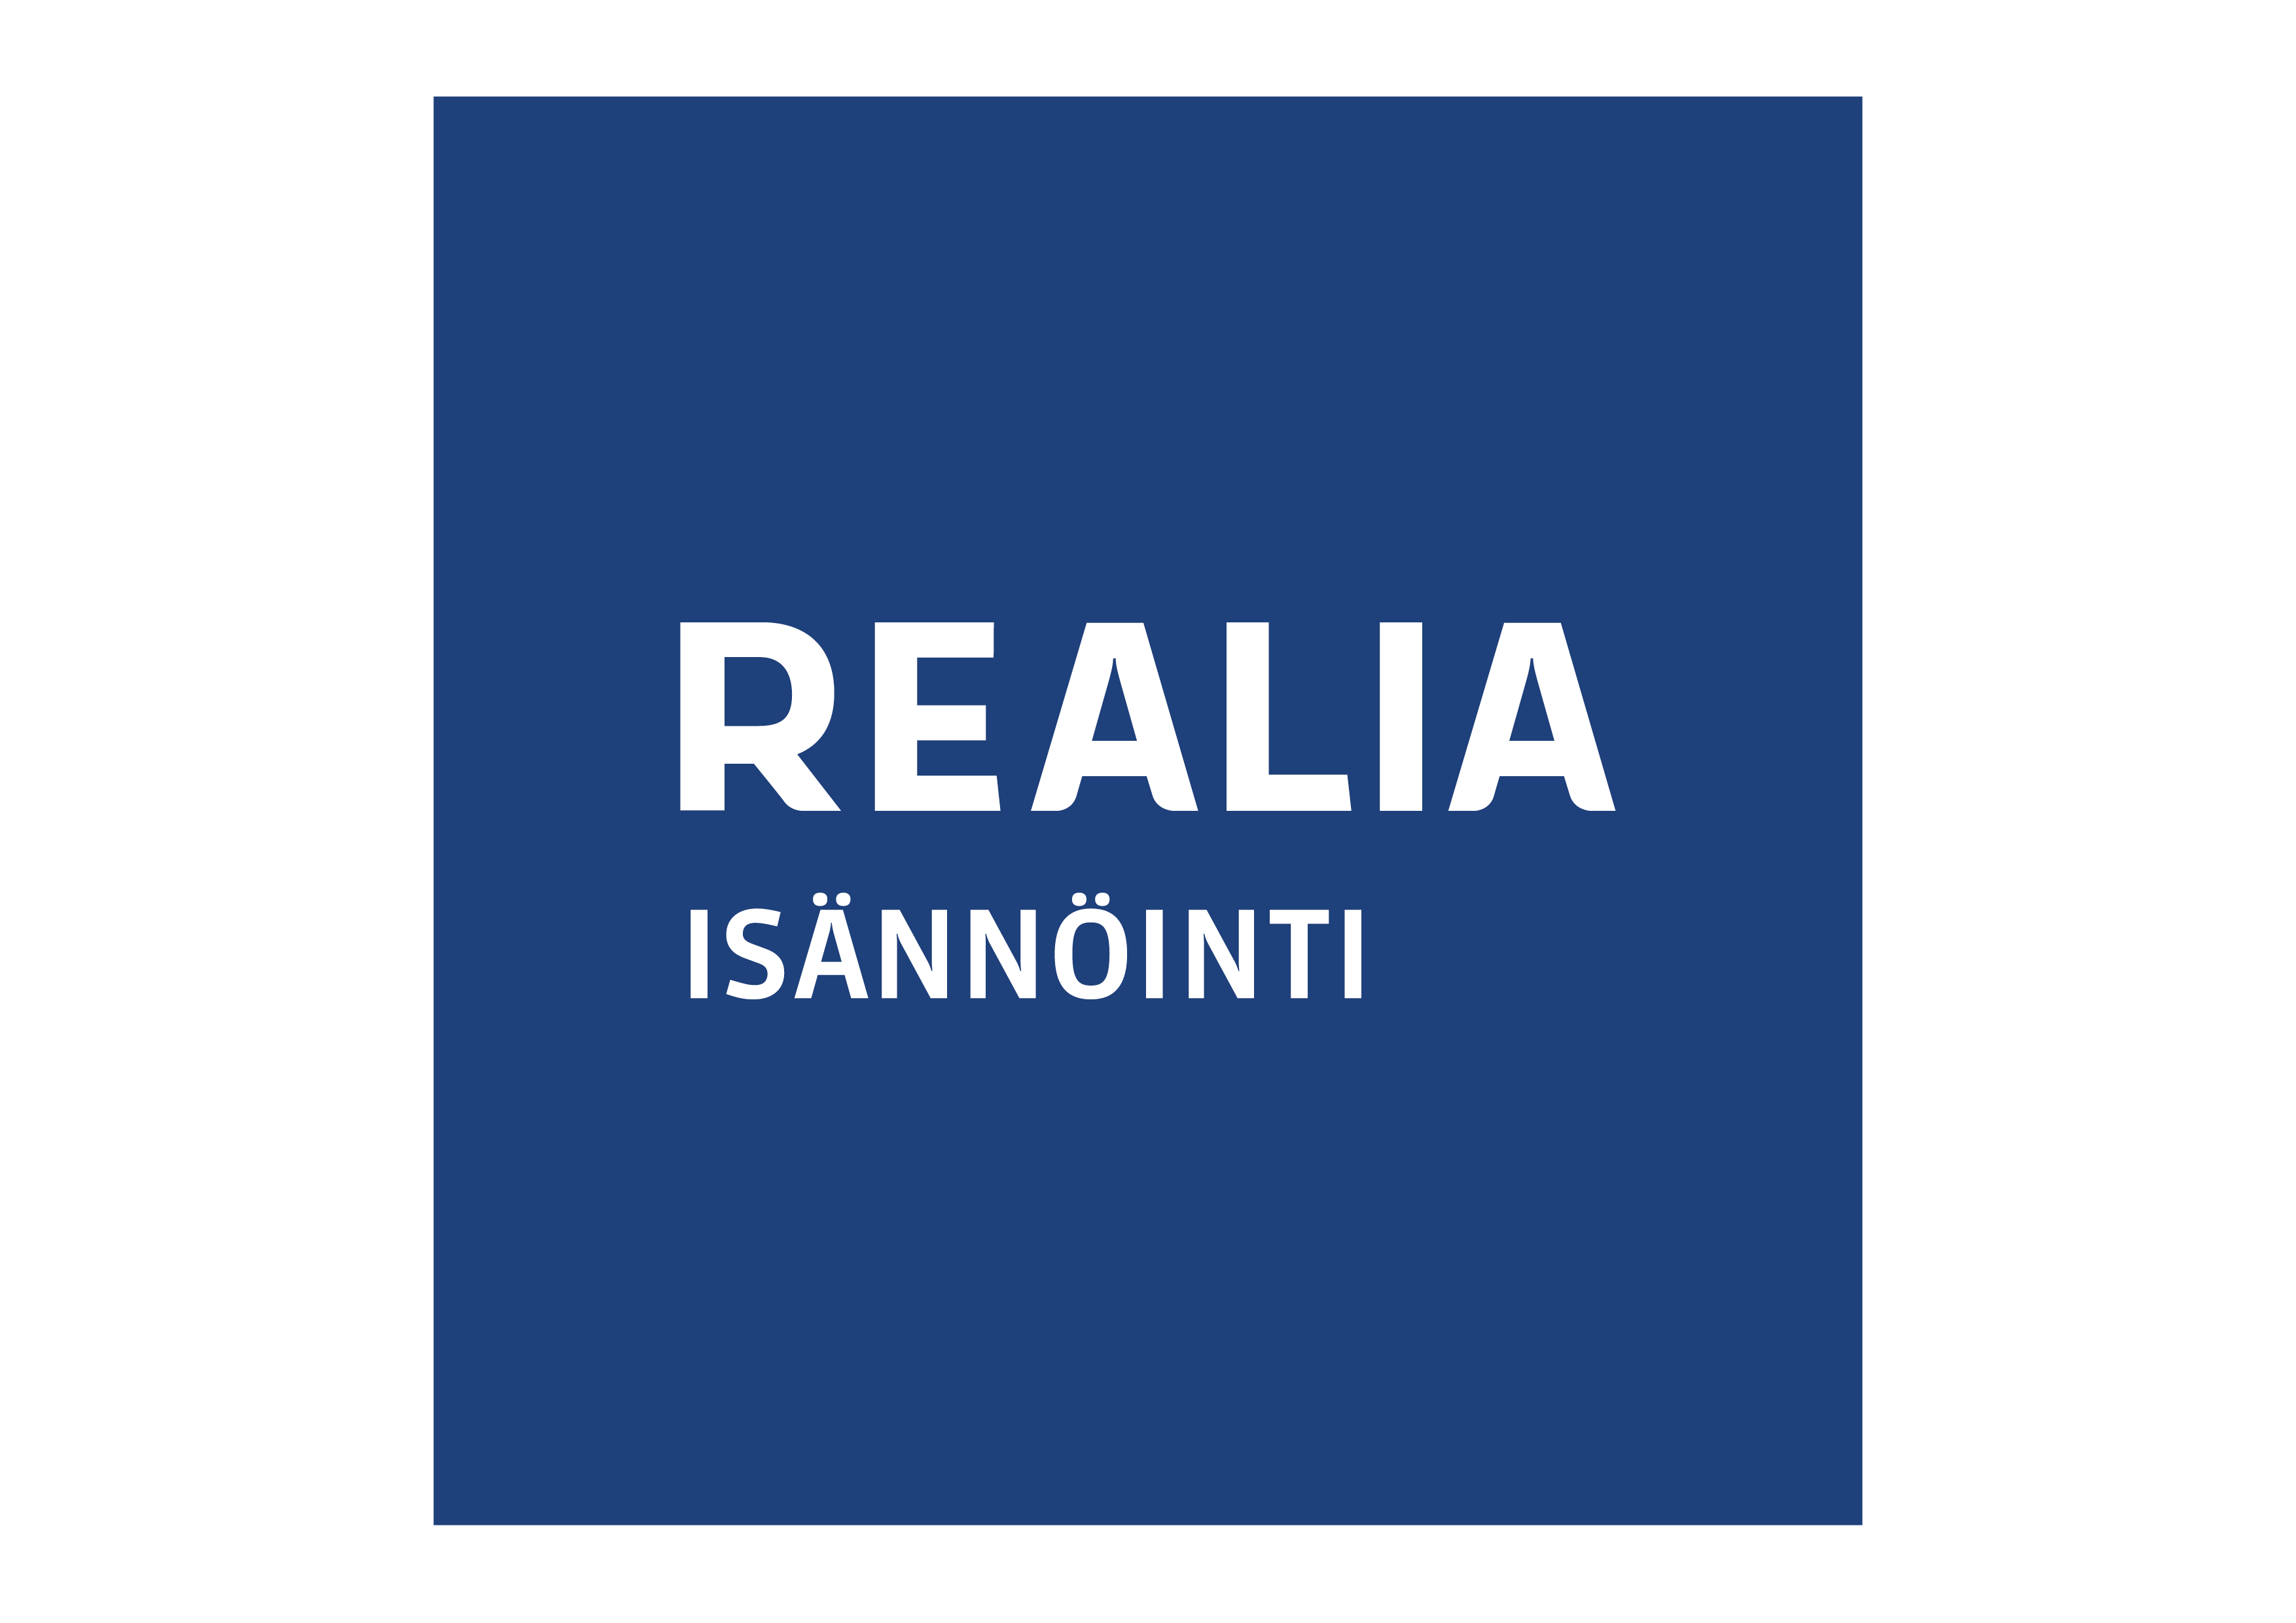 Realia Isännöinti Oy logo